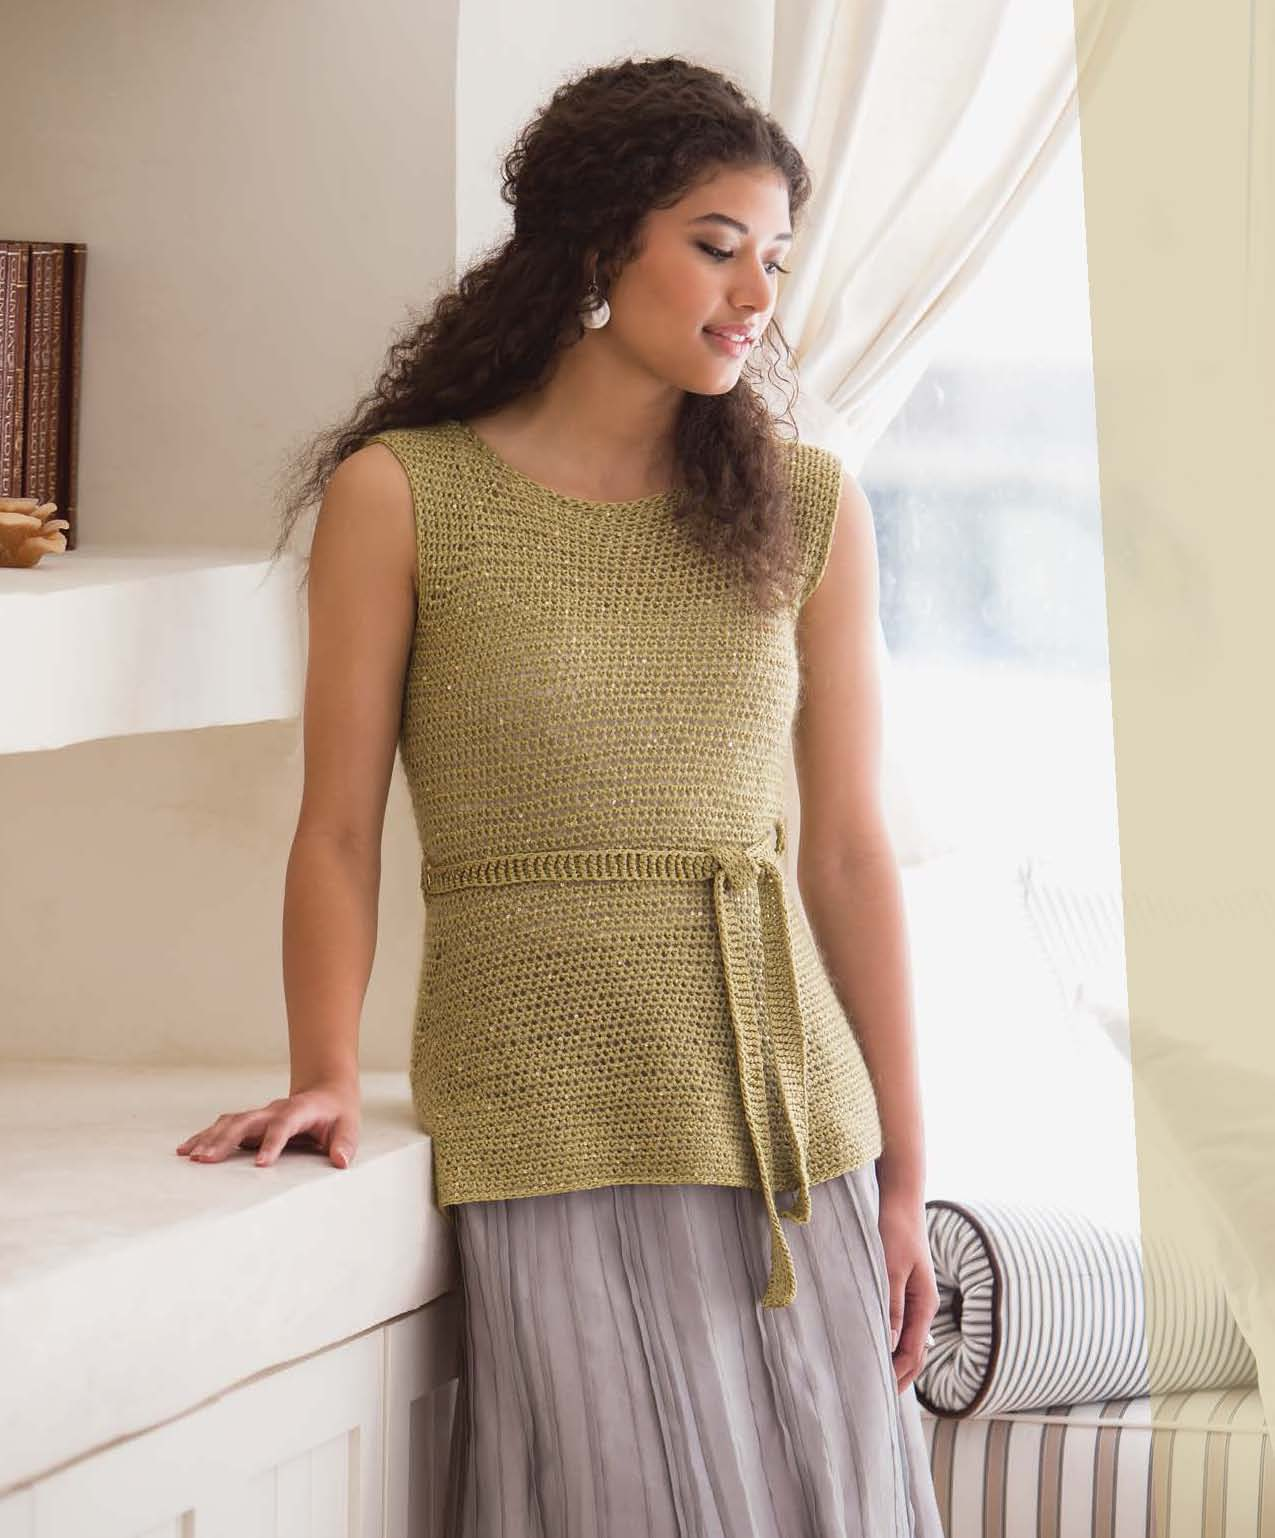 Crochet So Lovely - Simply Sparkly Tunic beauty shot.jpg